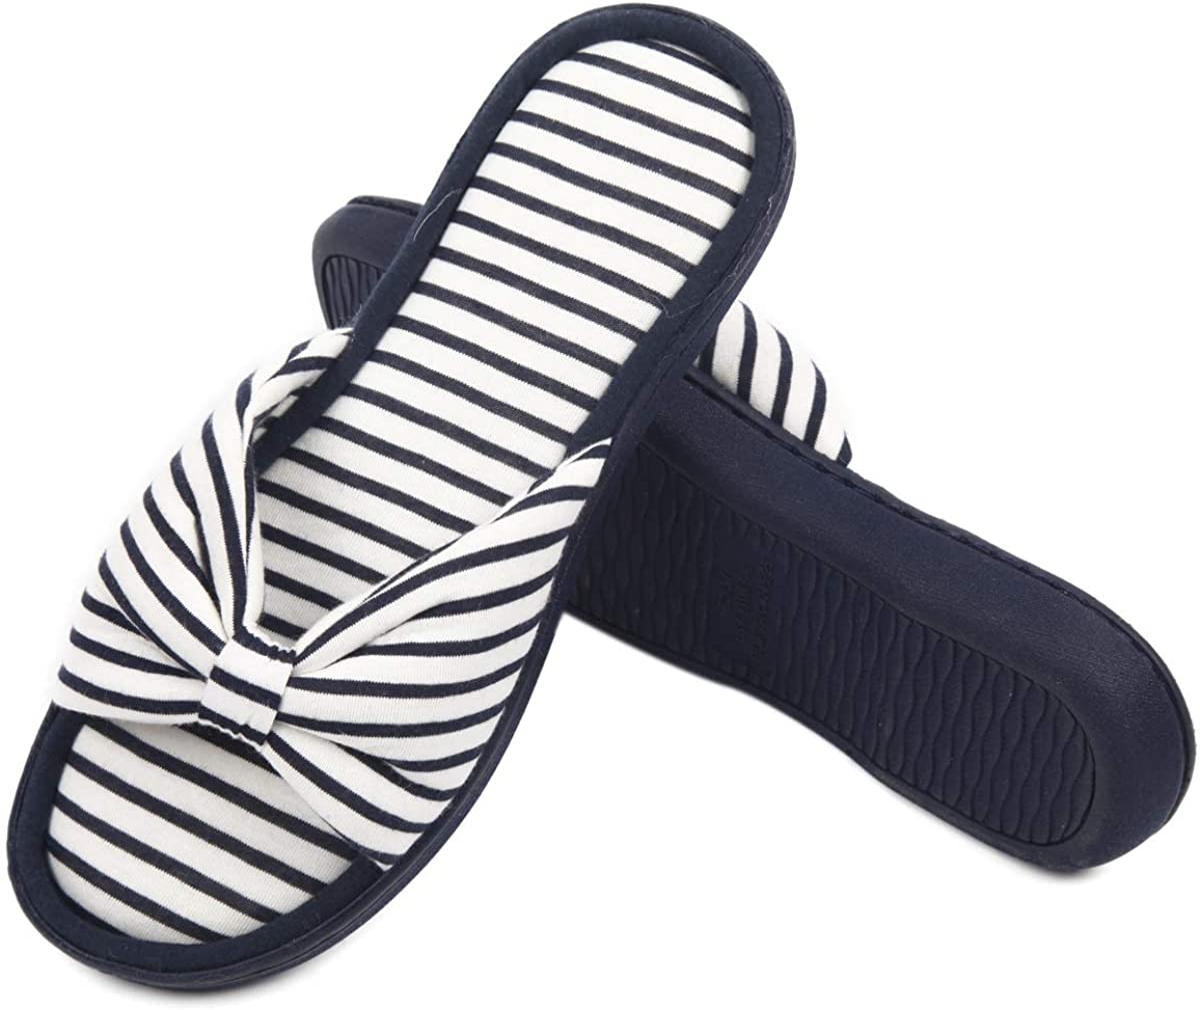 Caramella Bubble Women's Memory Foam Open Toe Slippers, Ladies Summer Spa House Slides Mules Bedroom Indoor Outdoor Sandals